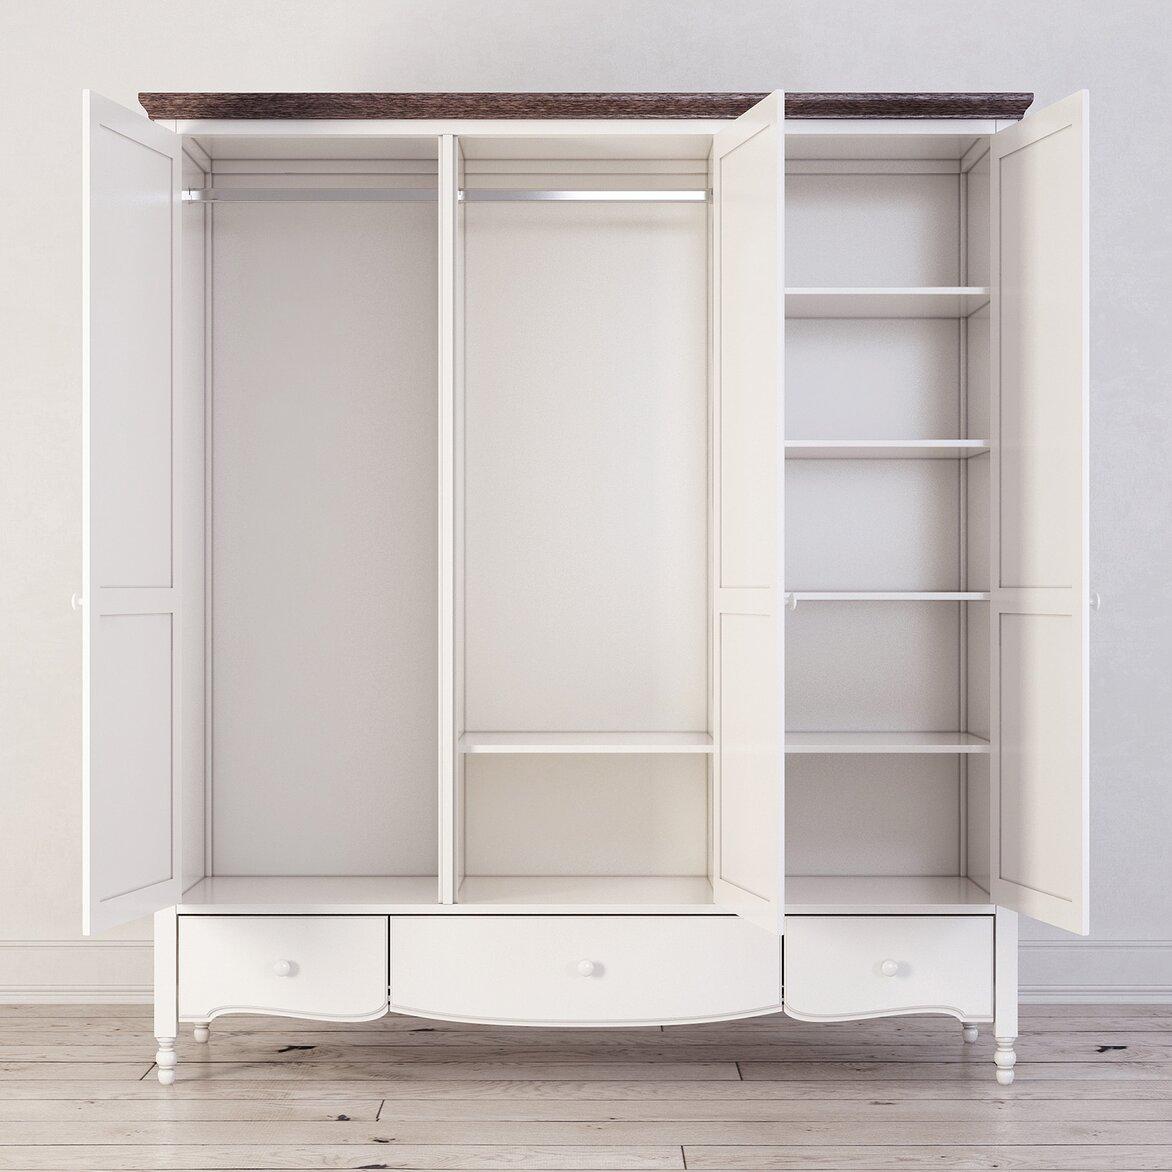 Шкаф трехстворчатый Leblanc, белый (открытый)